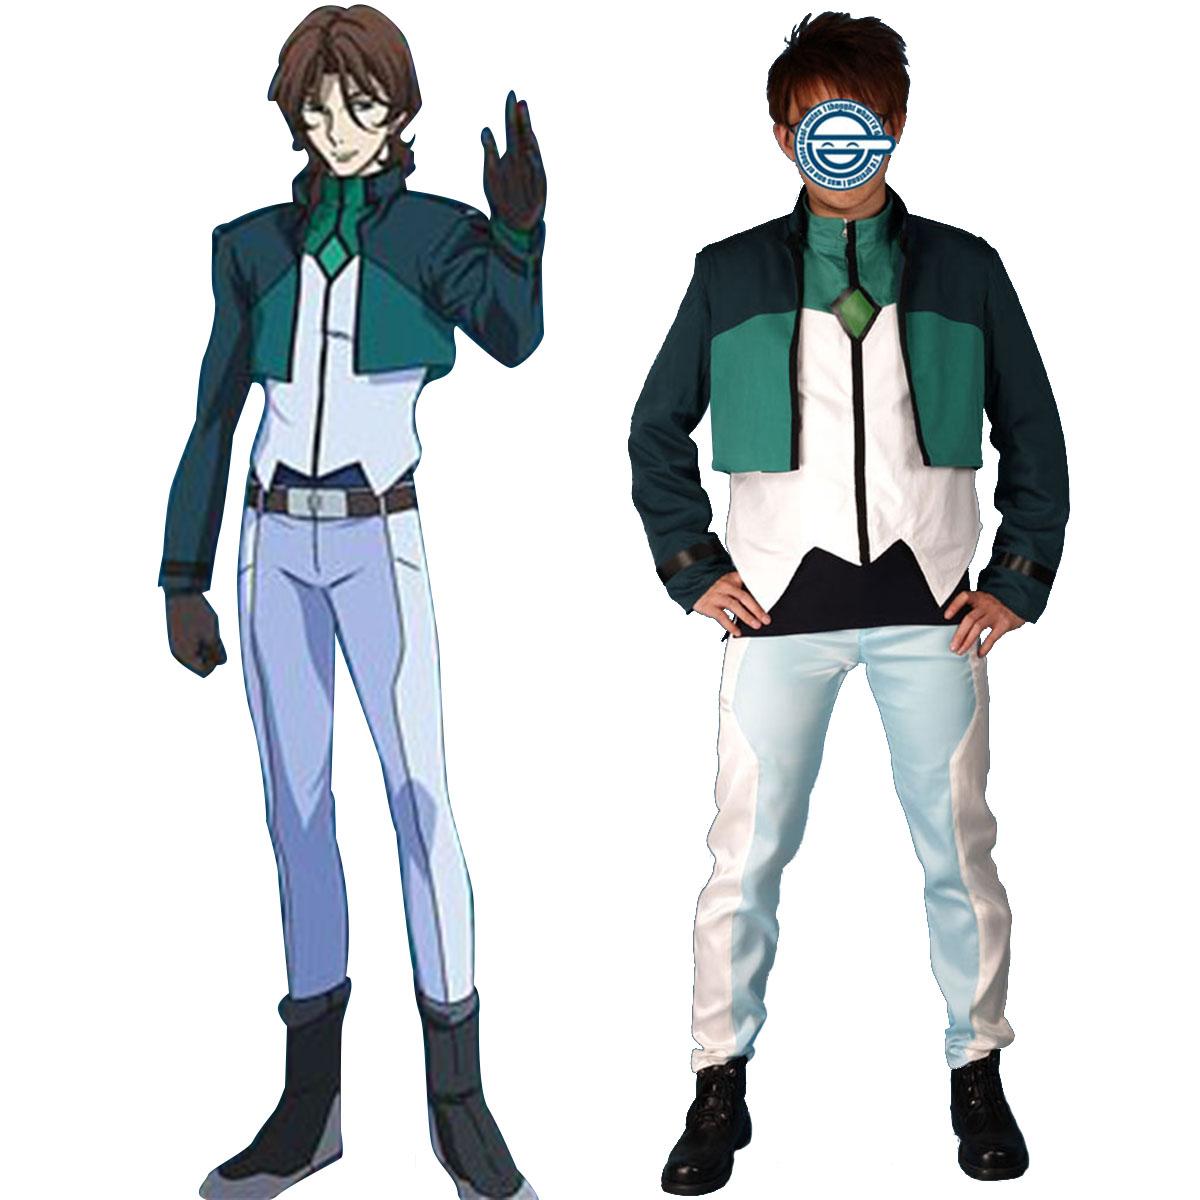 Kläder Gundam 00 Lockon Stratus Celestial Being Cosplay Karneval Kläder